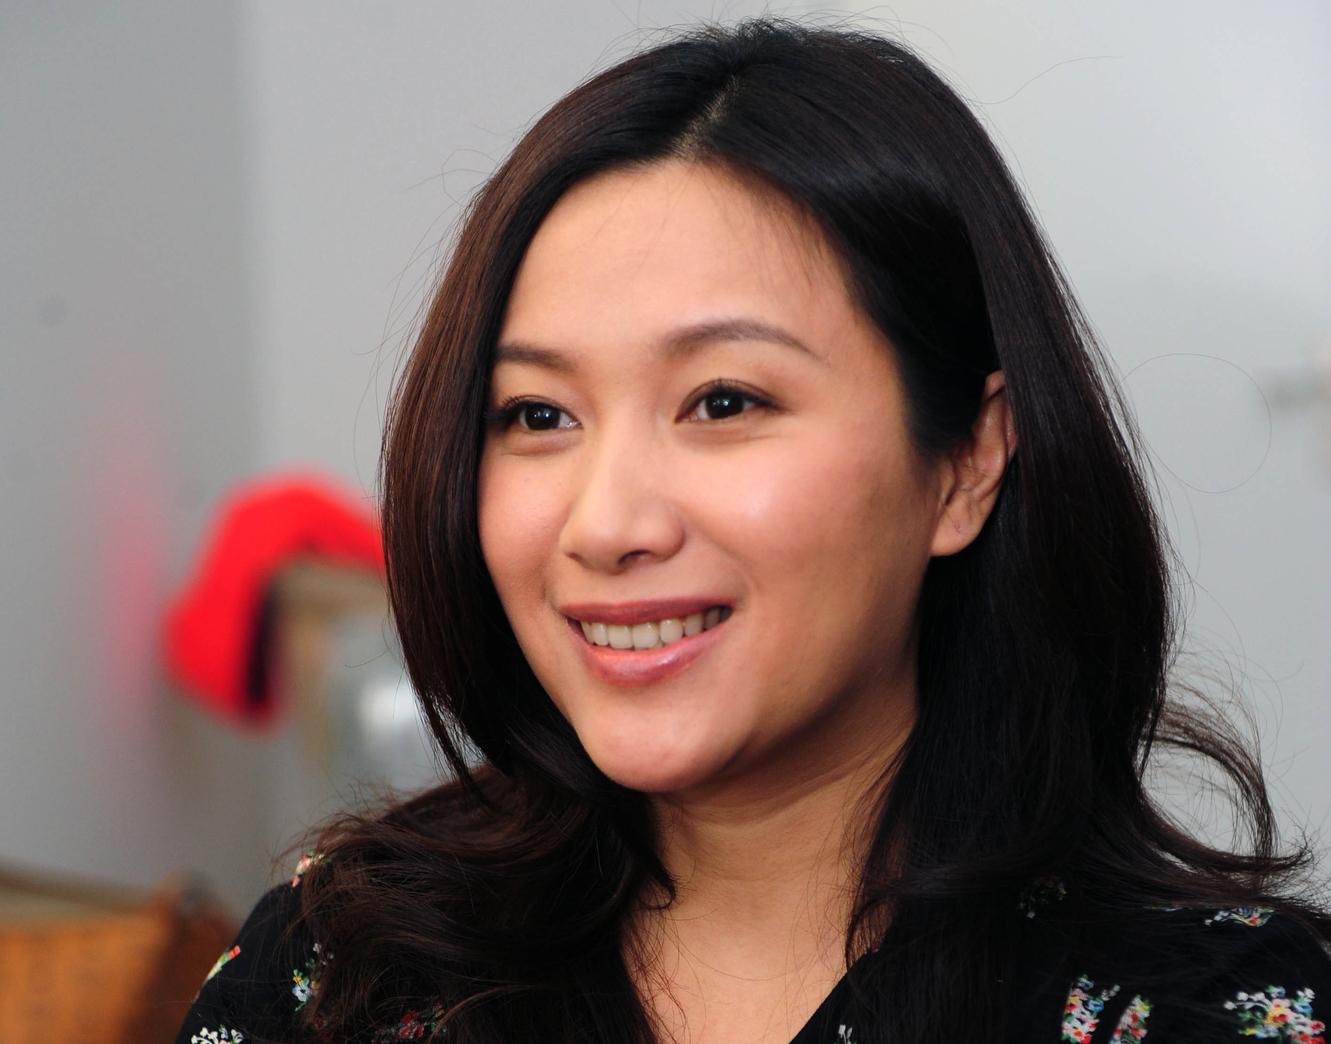 STAR HD PHOTOS: Chinese Actress Xu Jinglei Latest